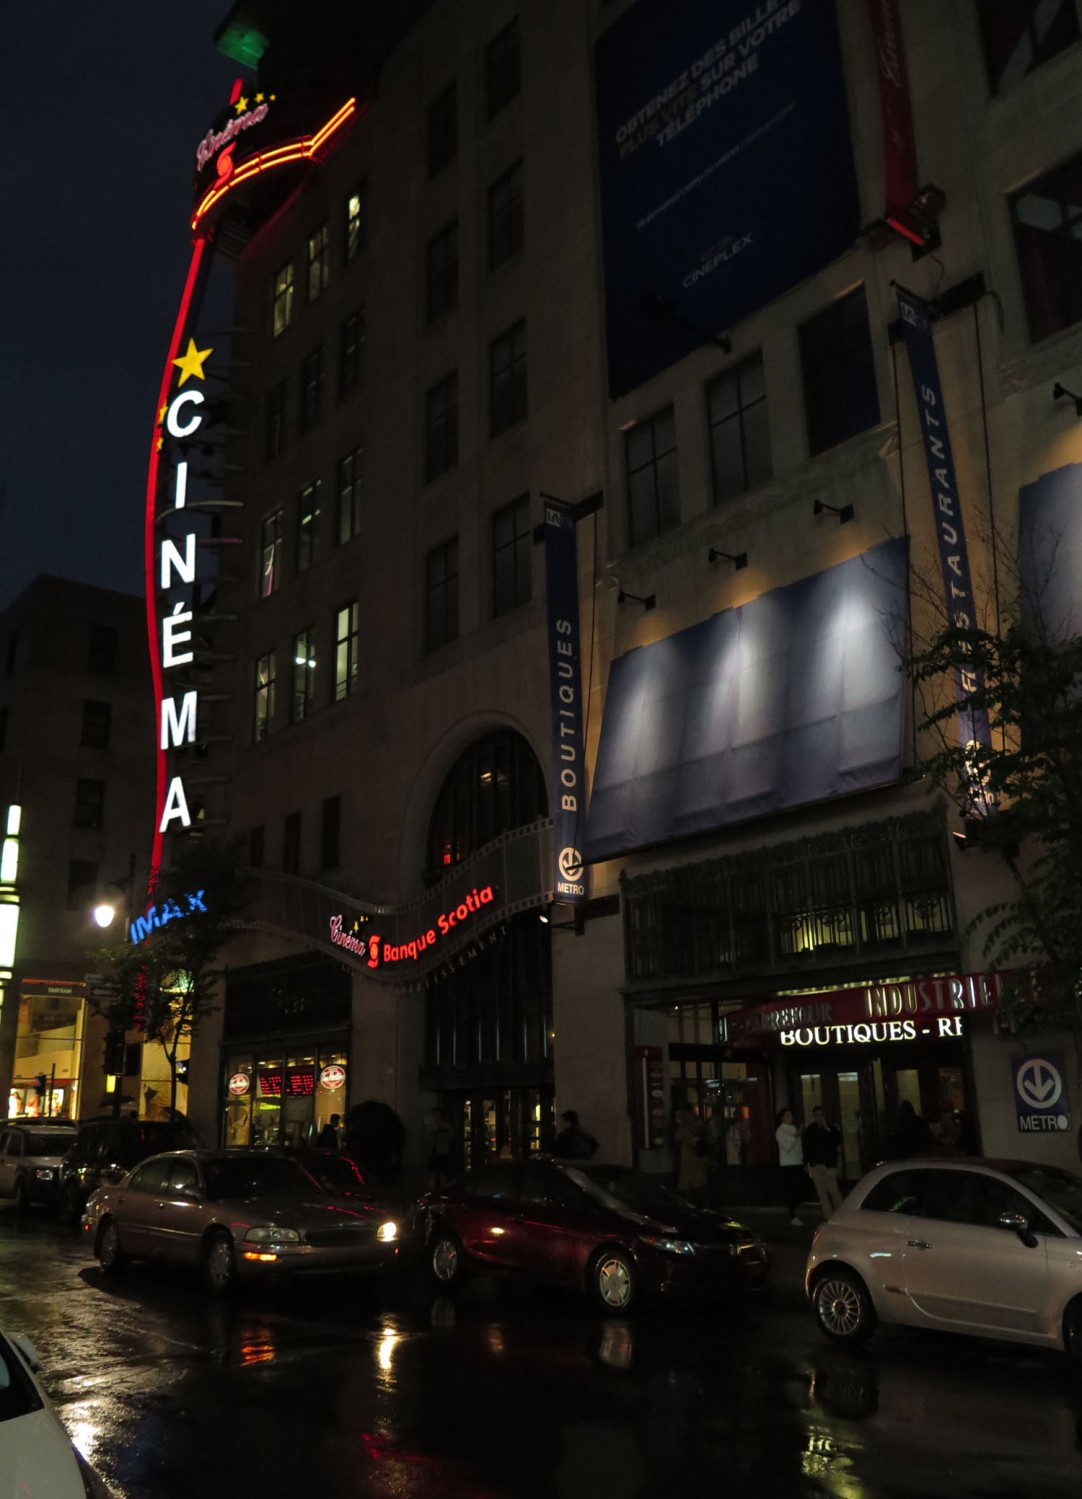 canada-montreal-street-scene-night